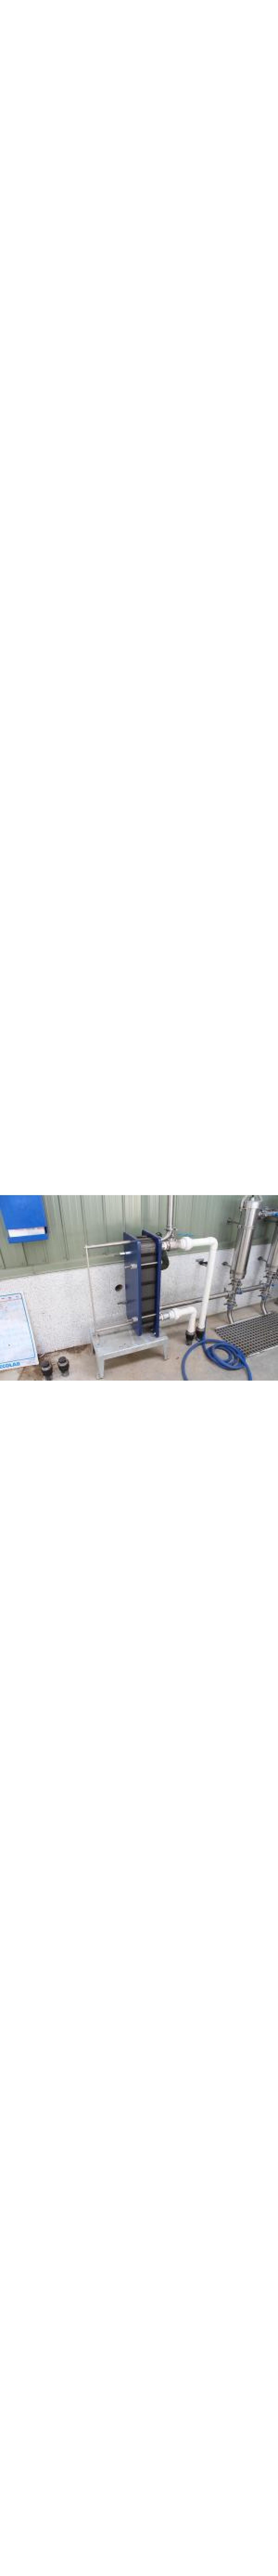 SupaFlo Industrial Plate cooler